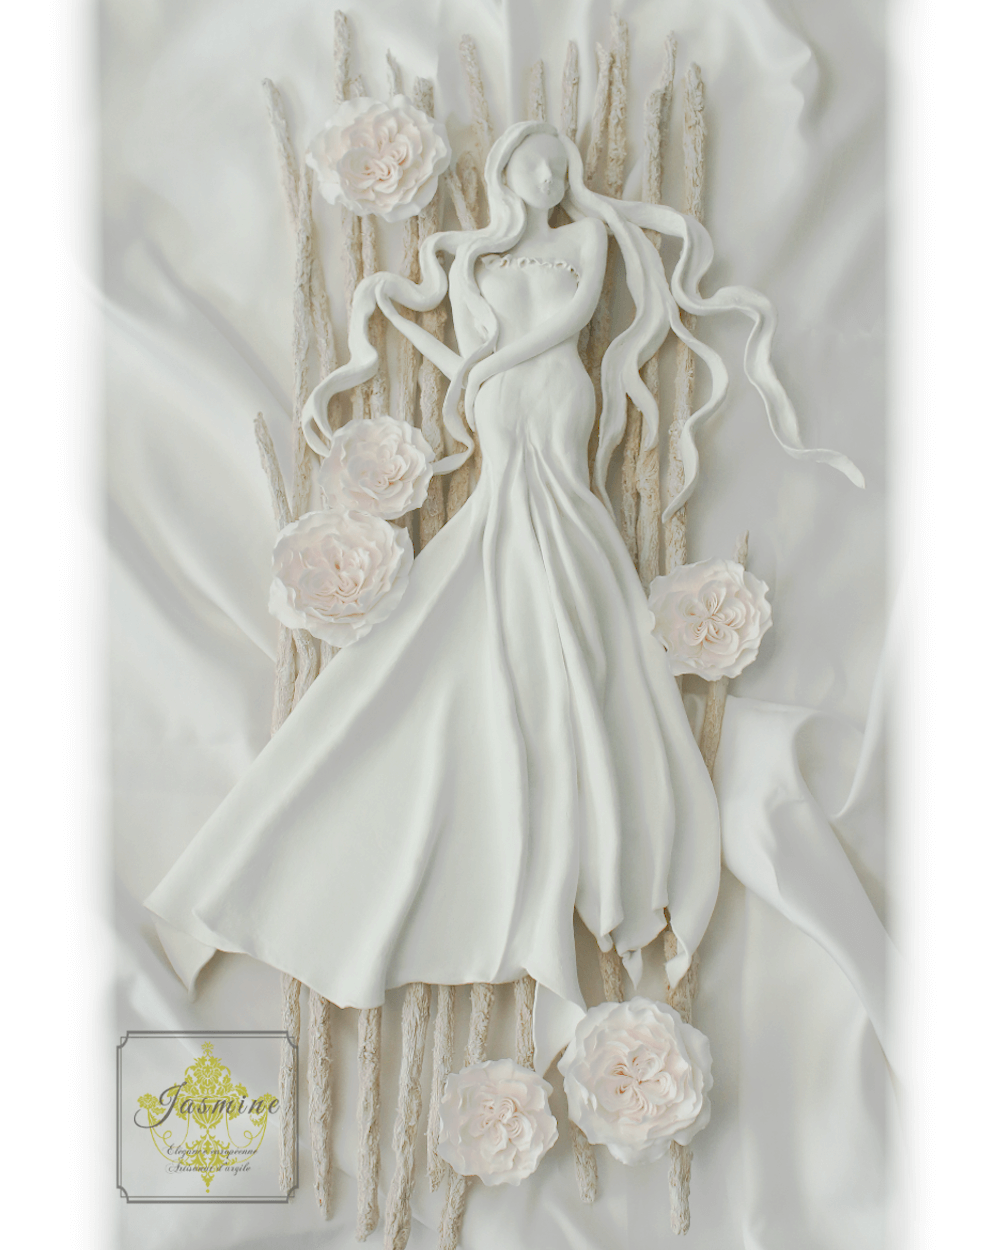 clayart-jasmine rosetto1